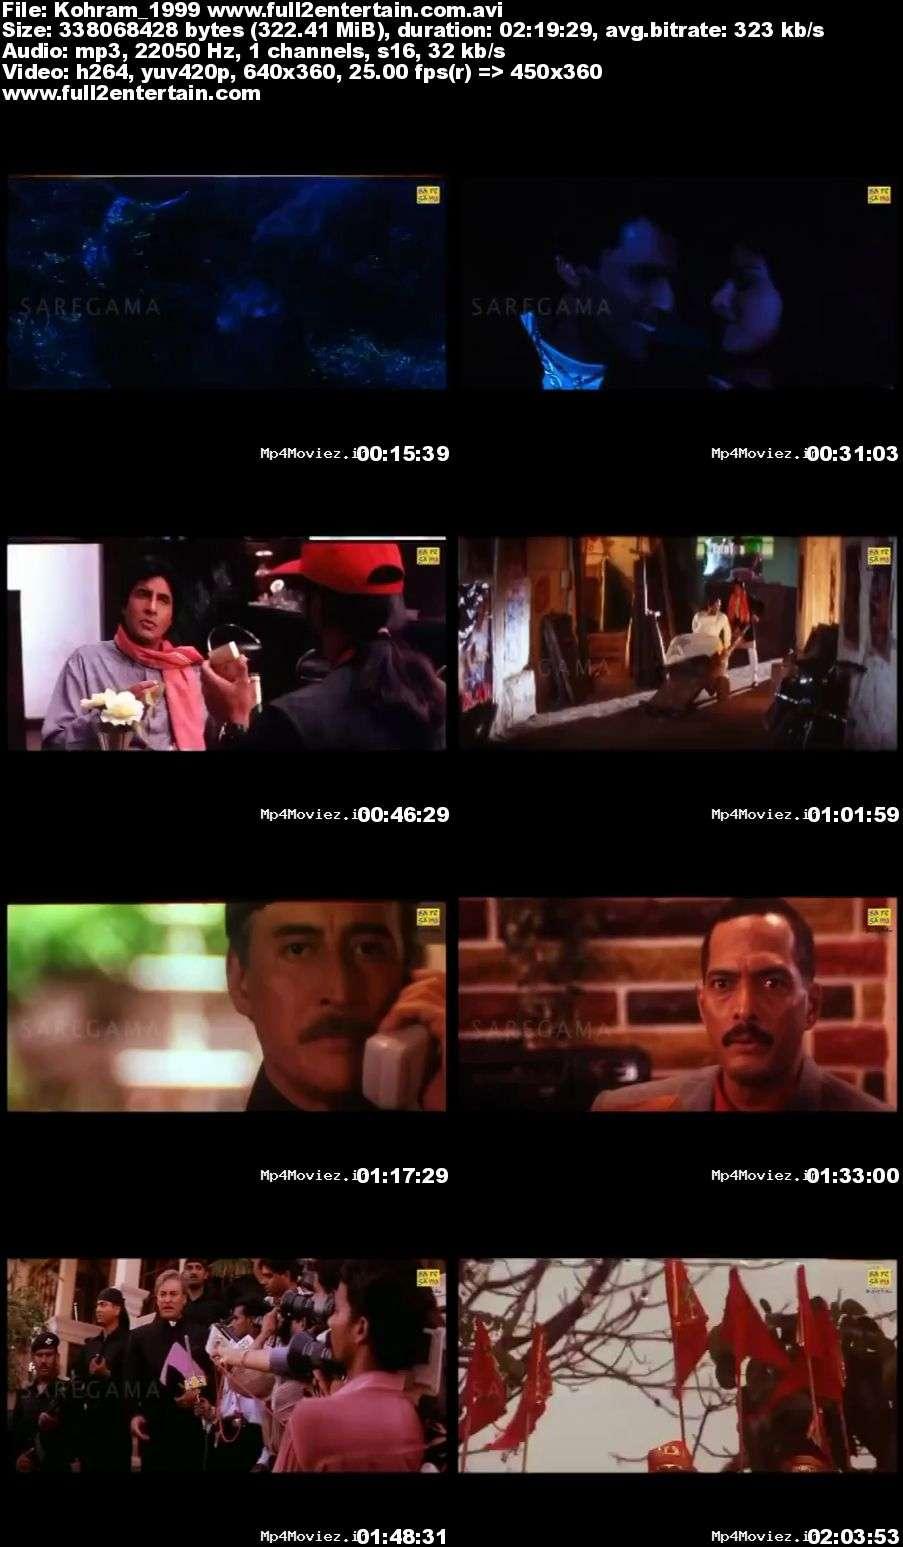 Kohram 1999 Full Movie Download Free in Dvdrip 480p